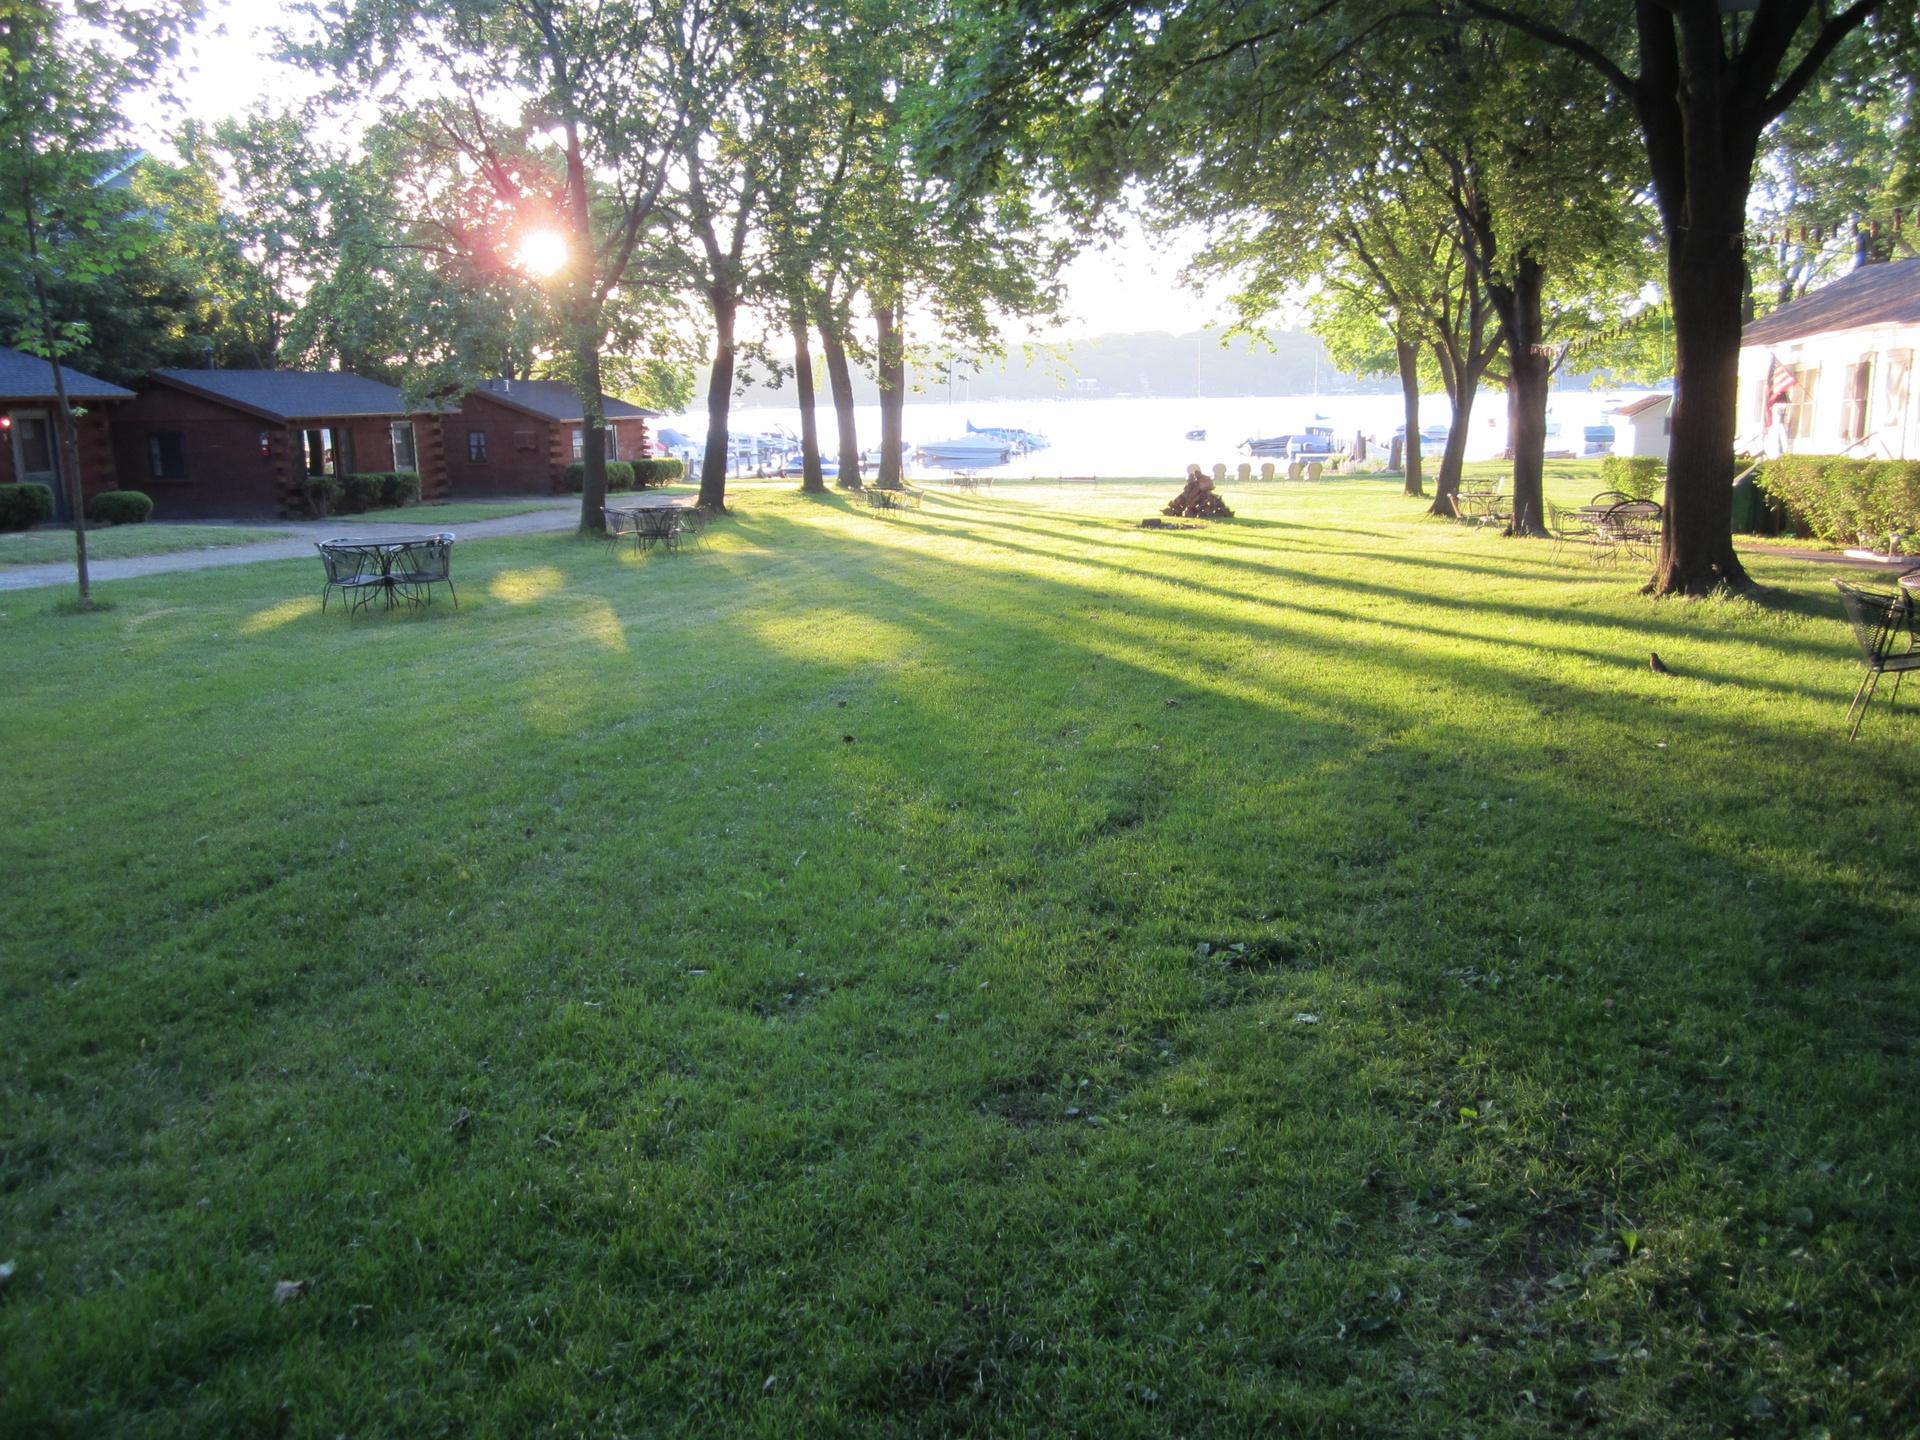 Lawn at dawn 2